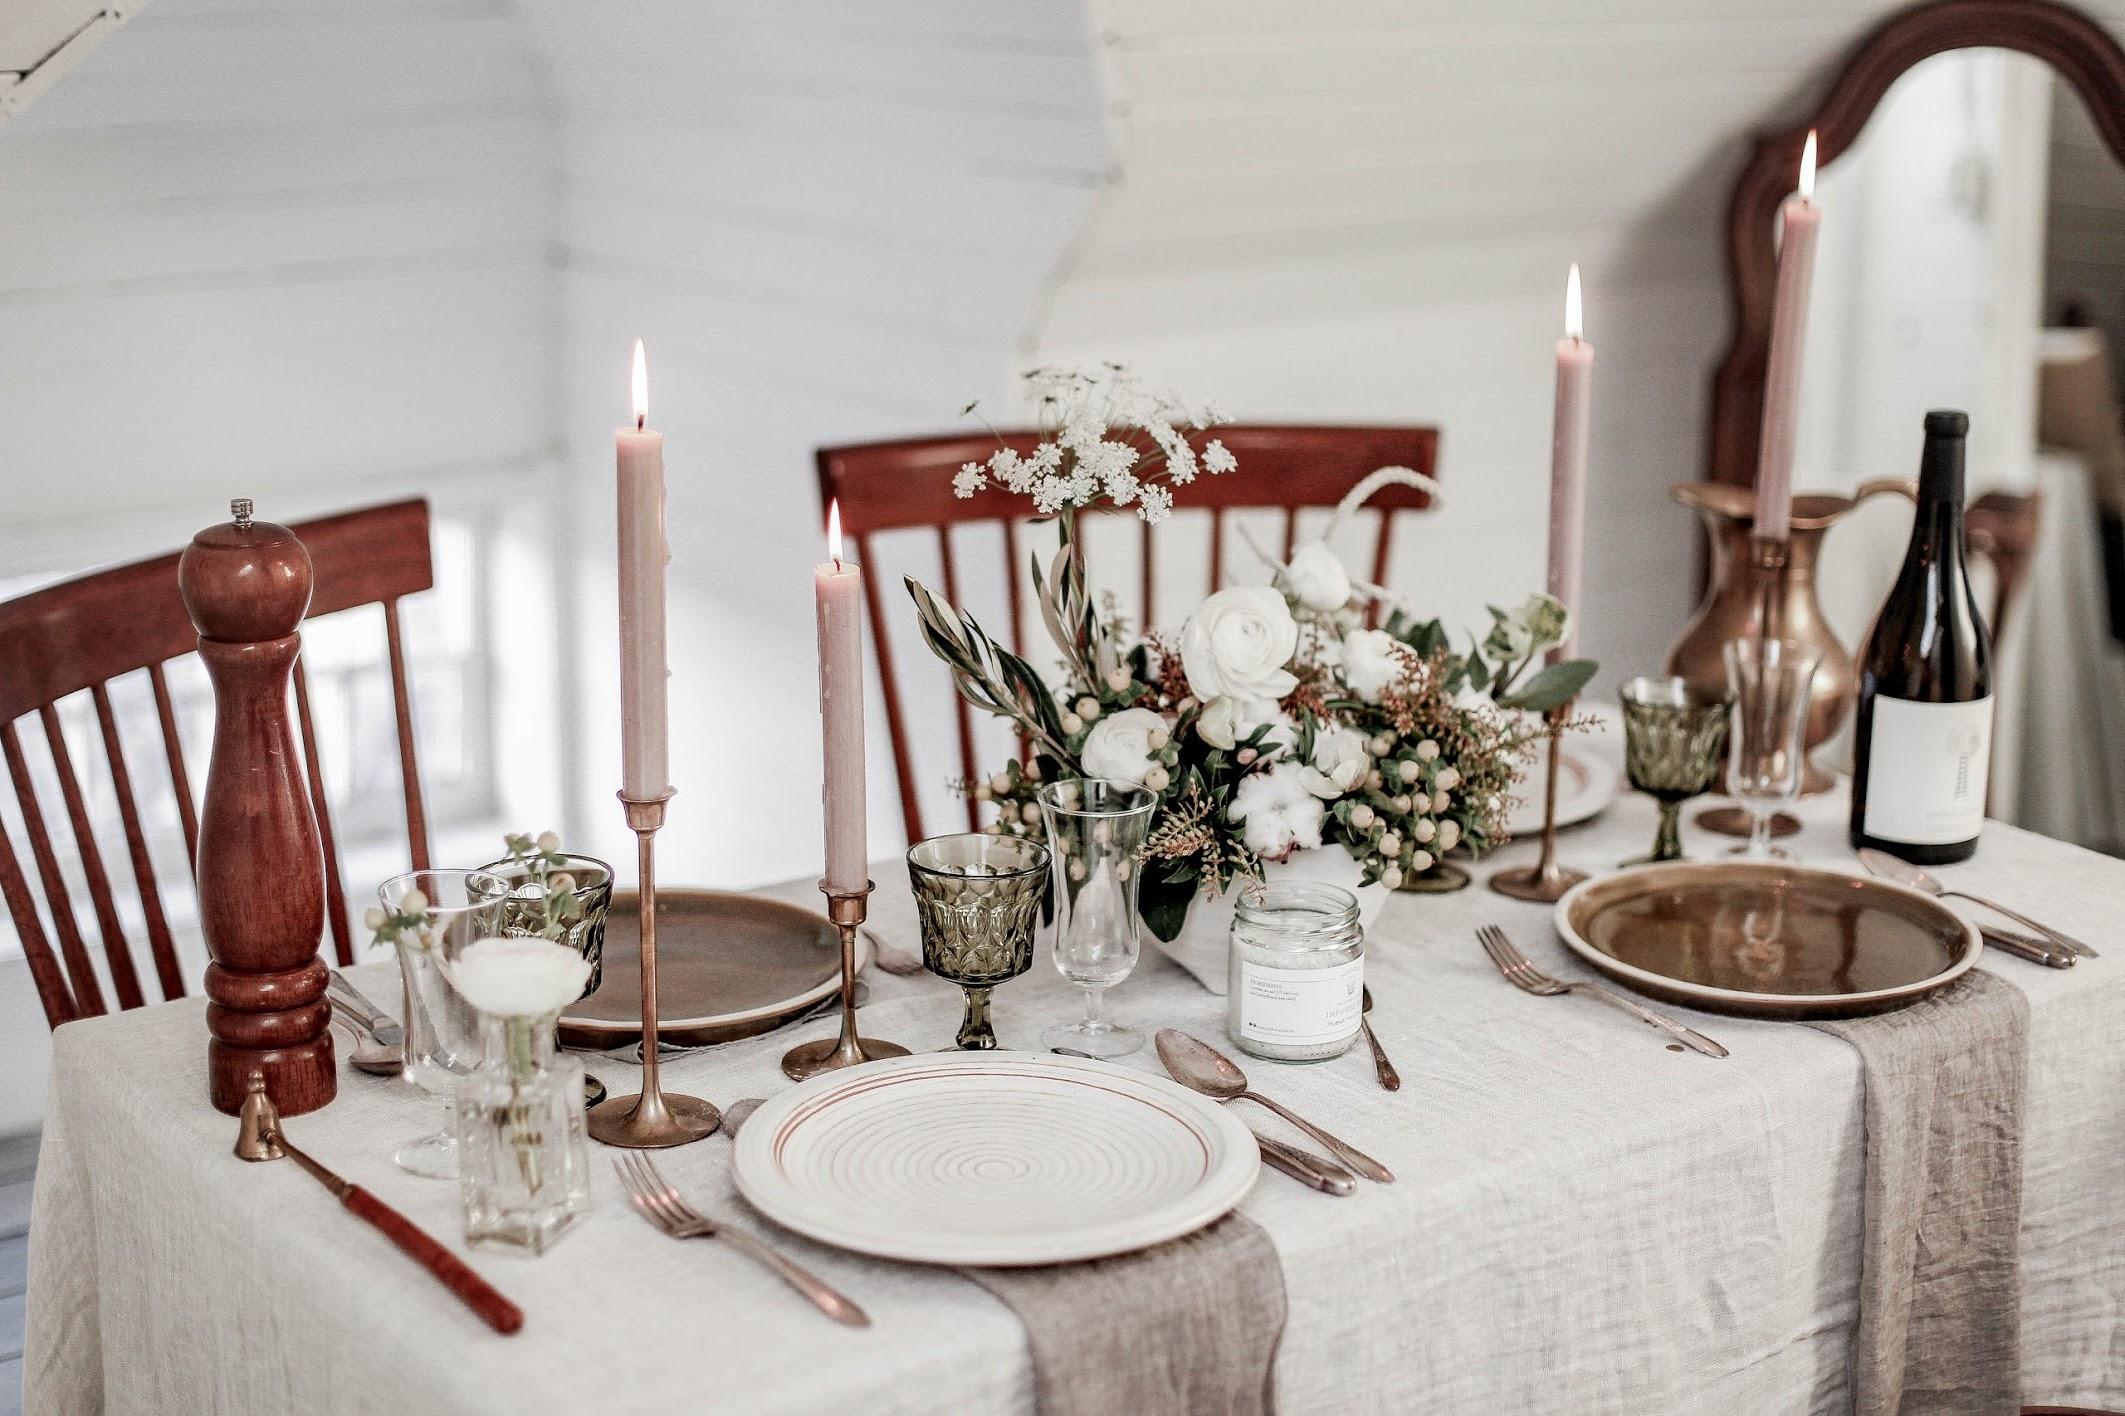 holiday-table-setting.jpg